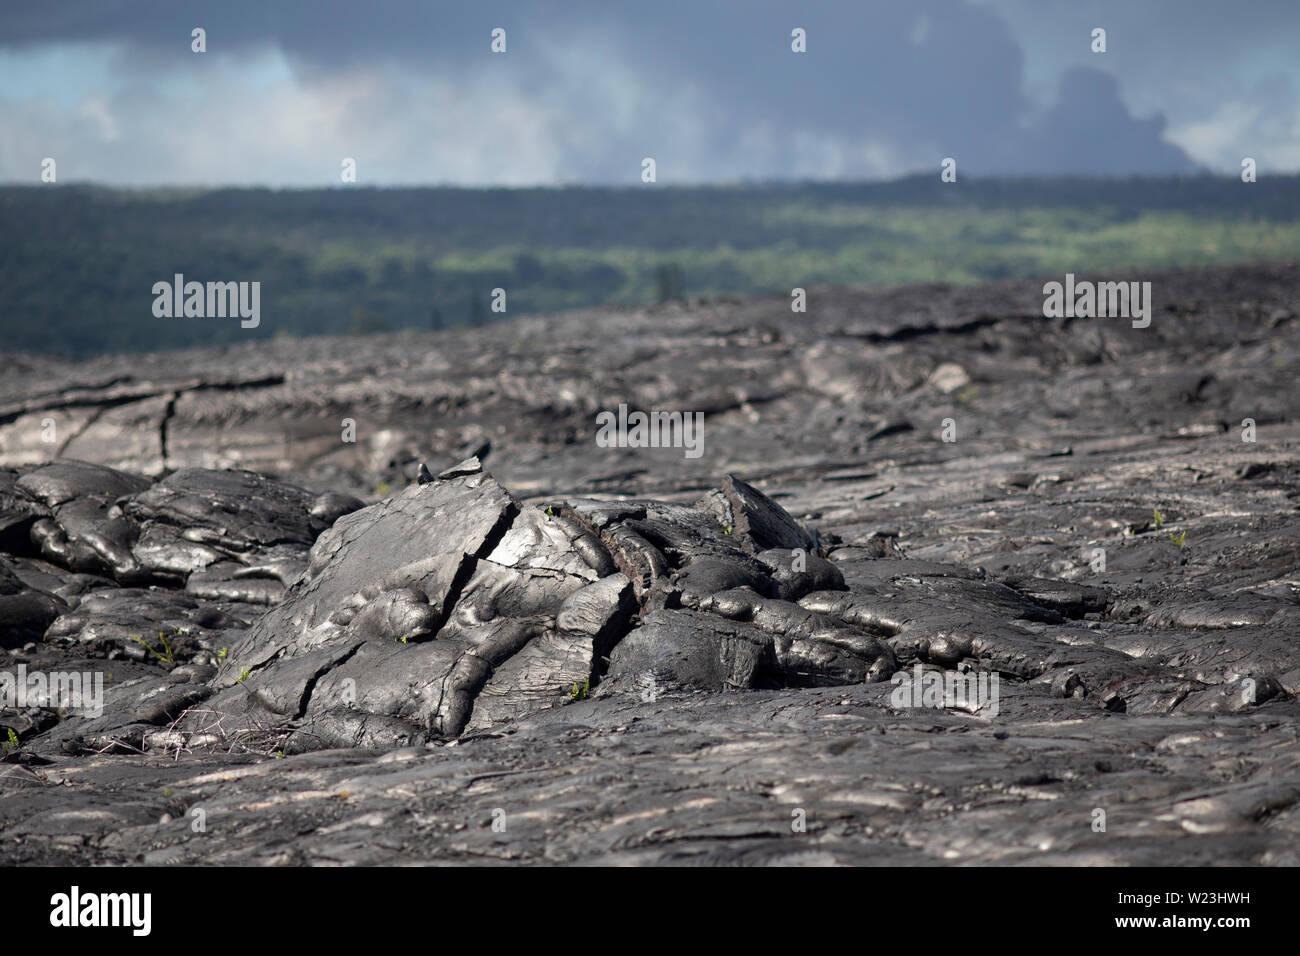 Field of pahoehoe lava rock on Kilauea volcano, Big Island, Hawaii - Stock Image